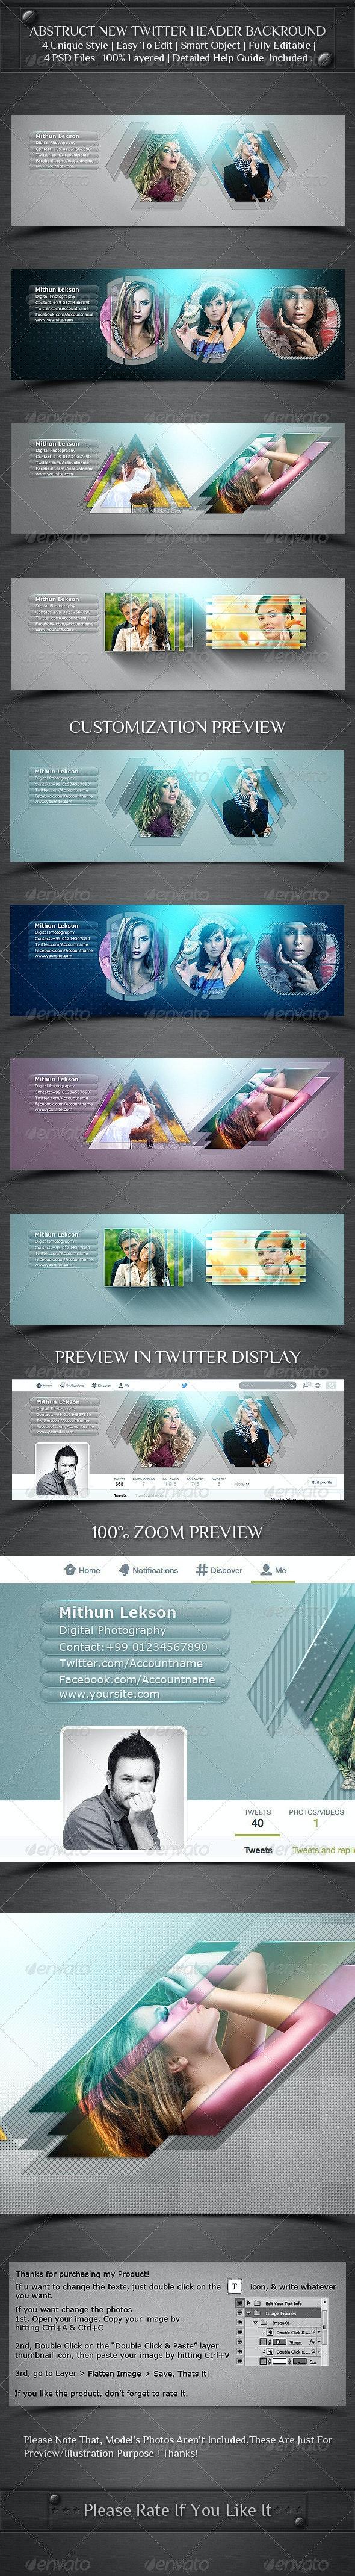 Abstruct New Twitter Profile Header Backround - Twitter Social Media